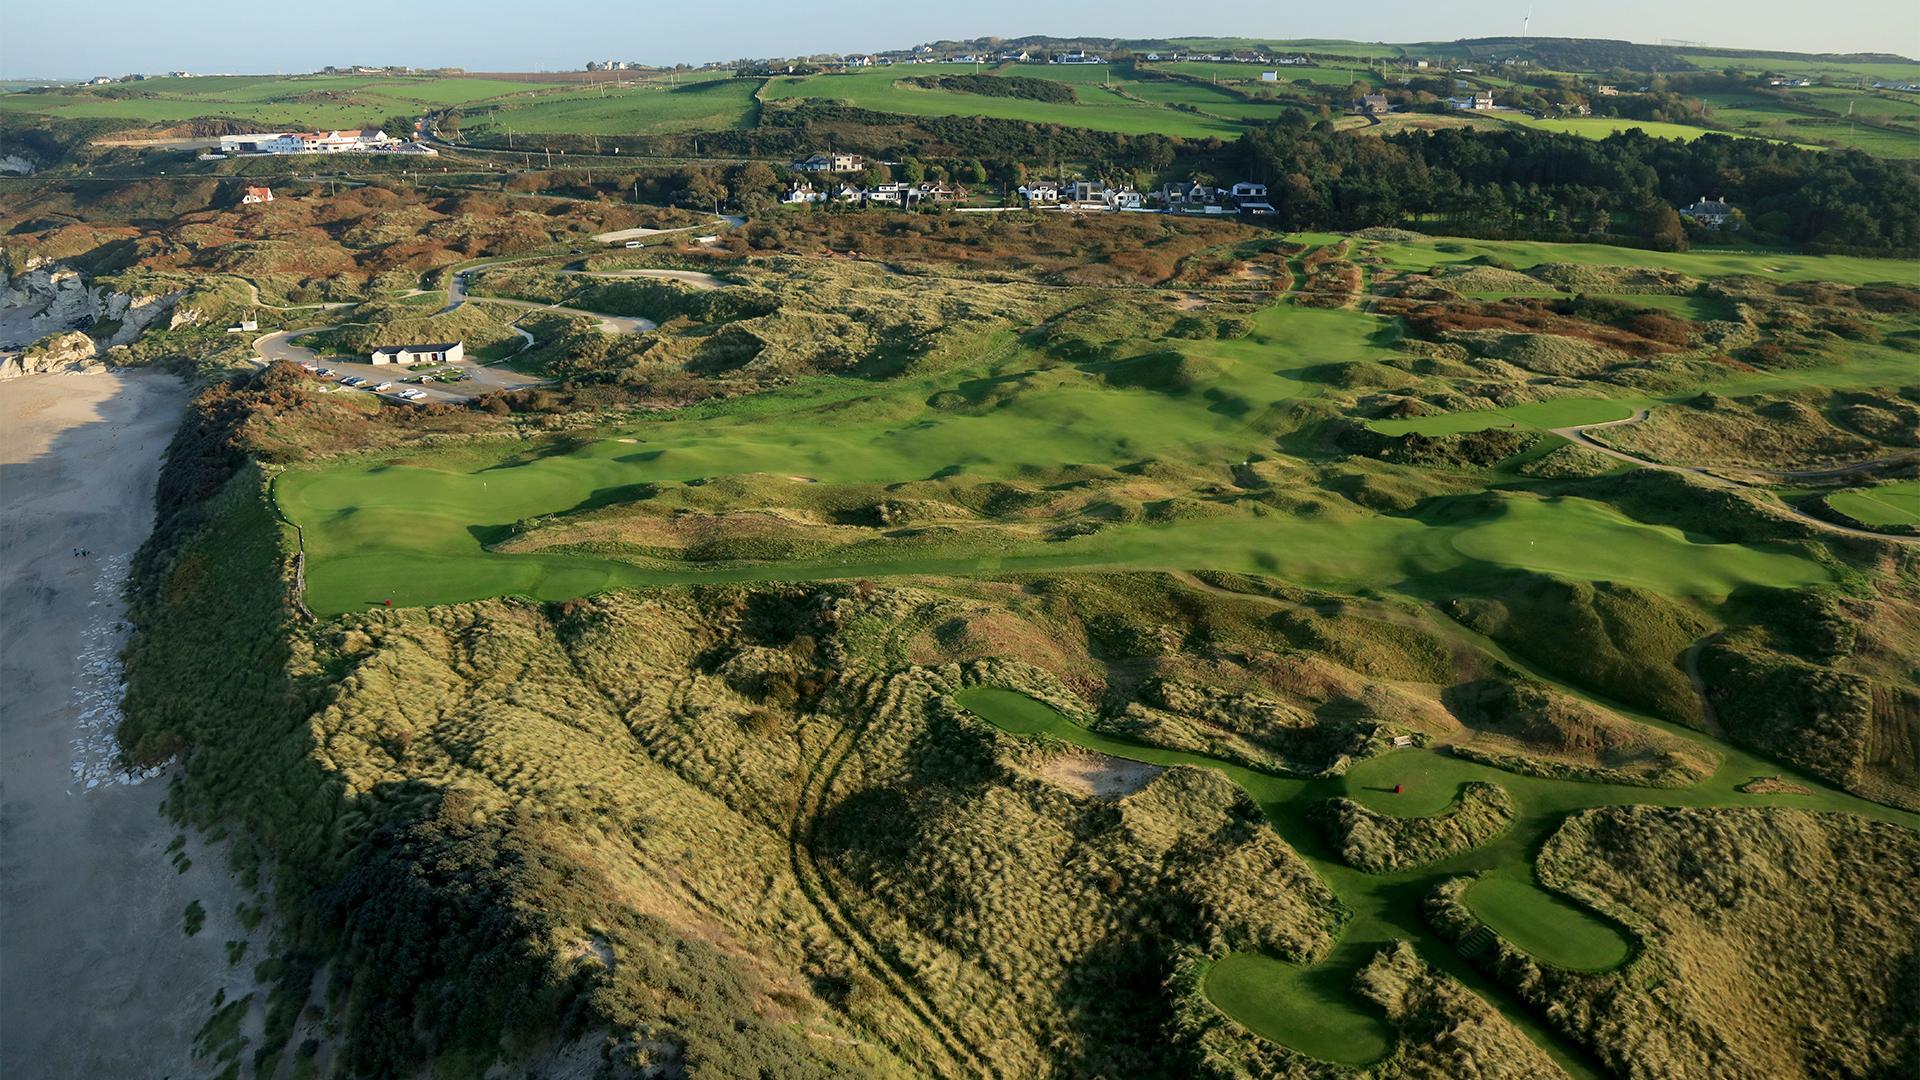 Royal Portrush, 5th hole, Dunluce Links golf course